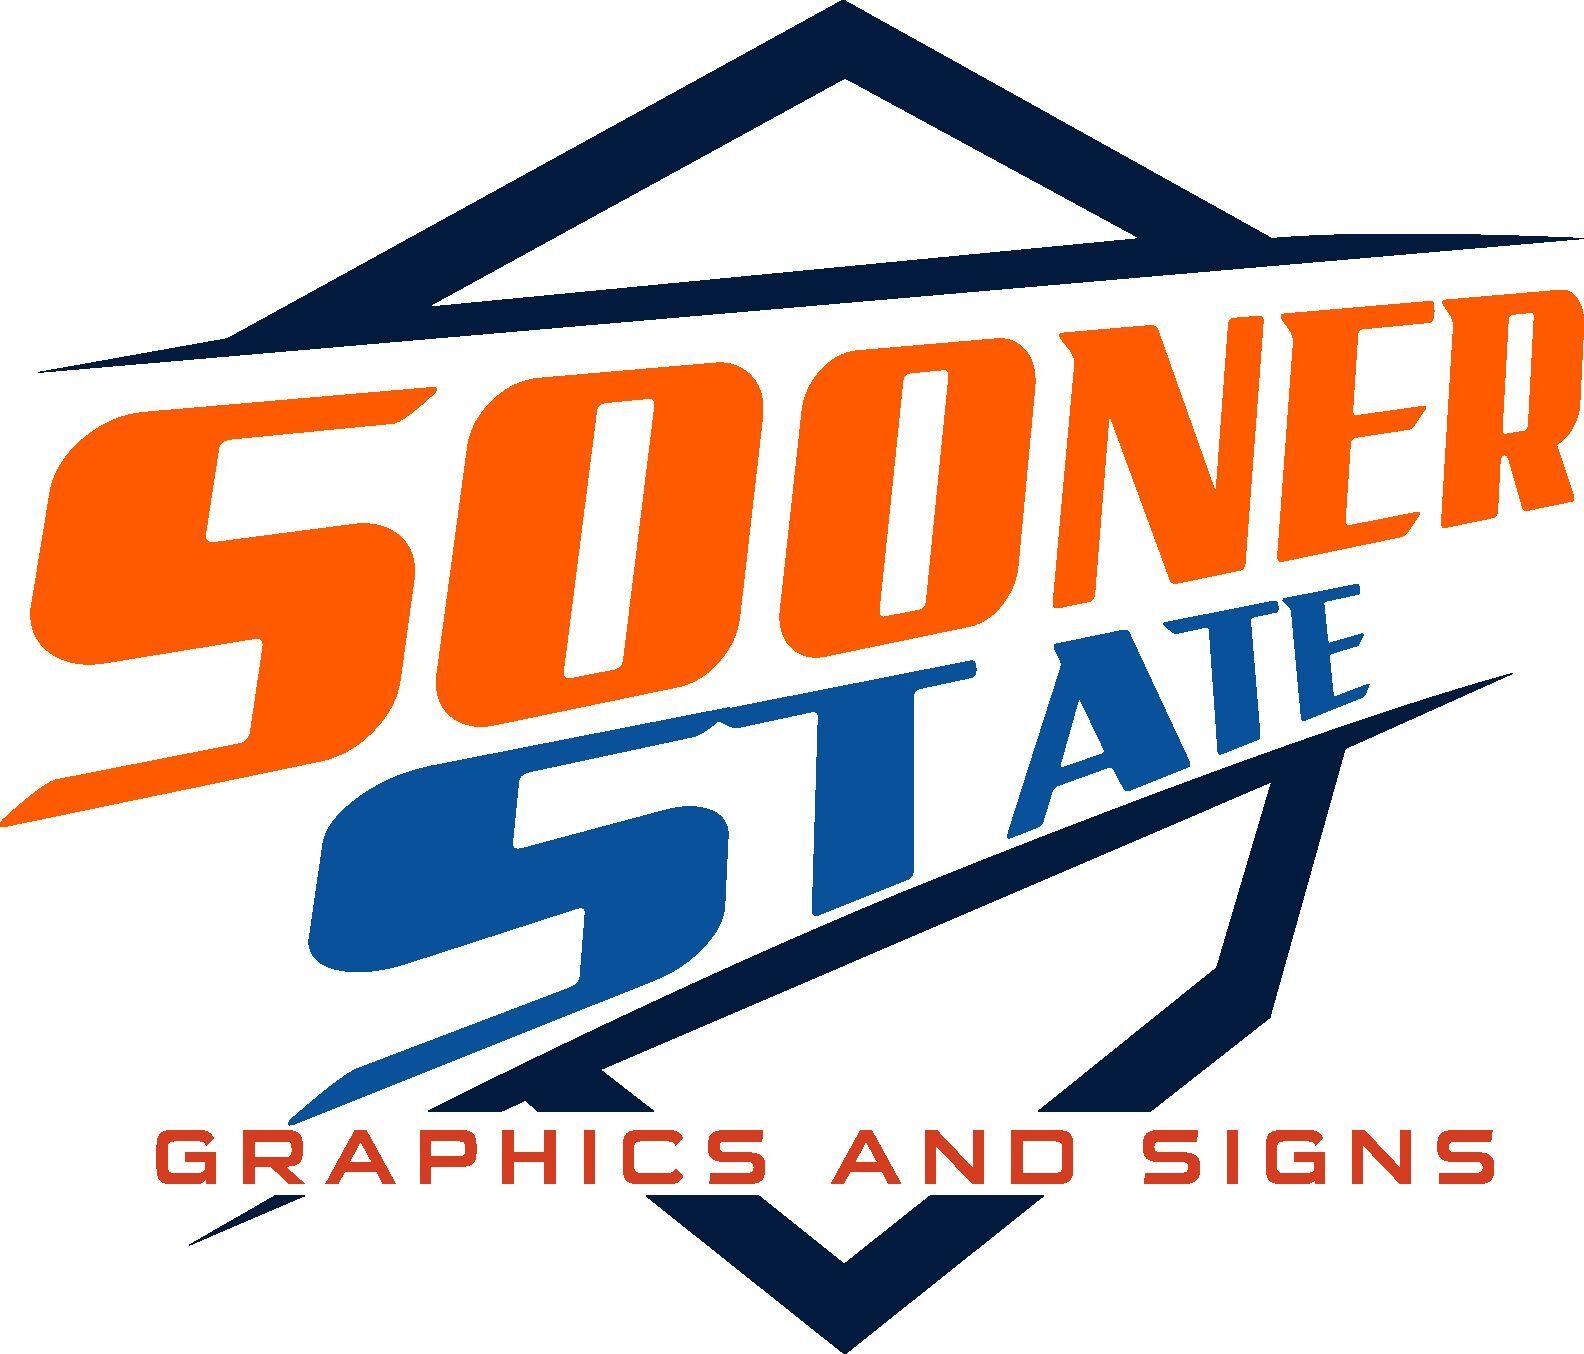 Sooner State Graphics